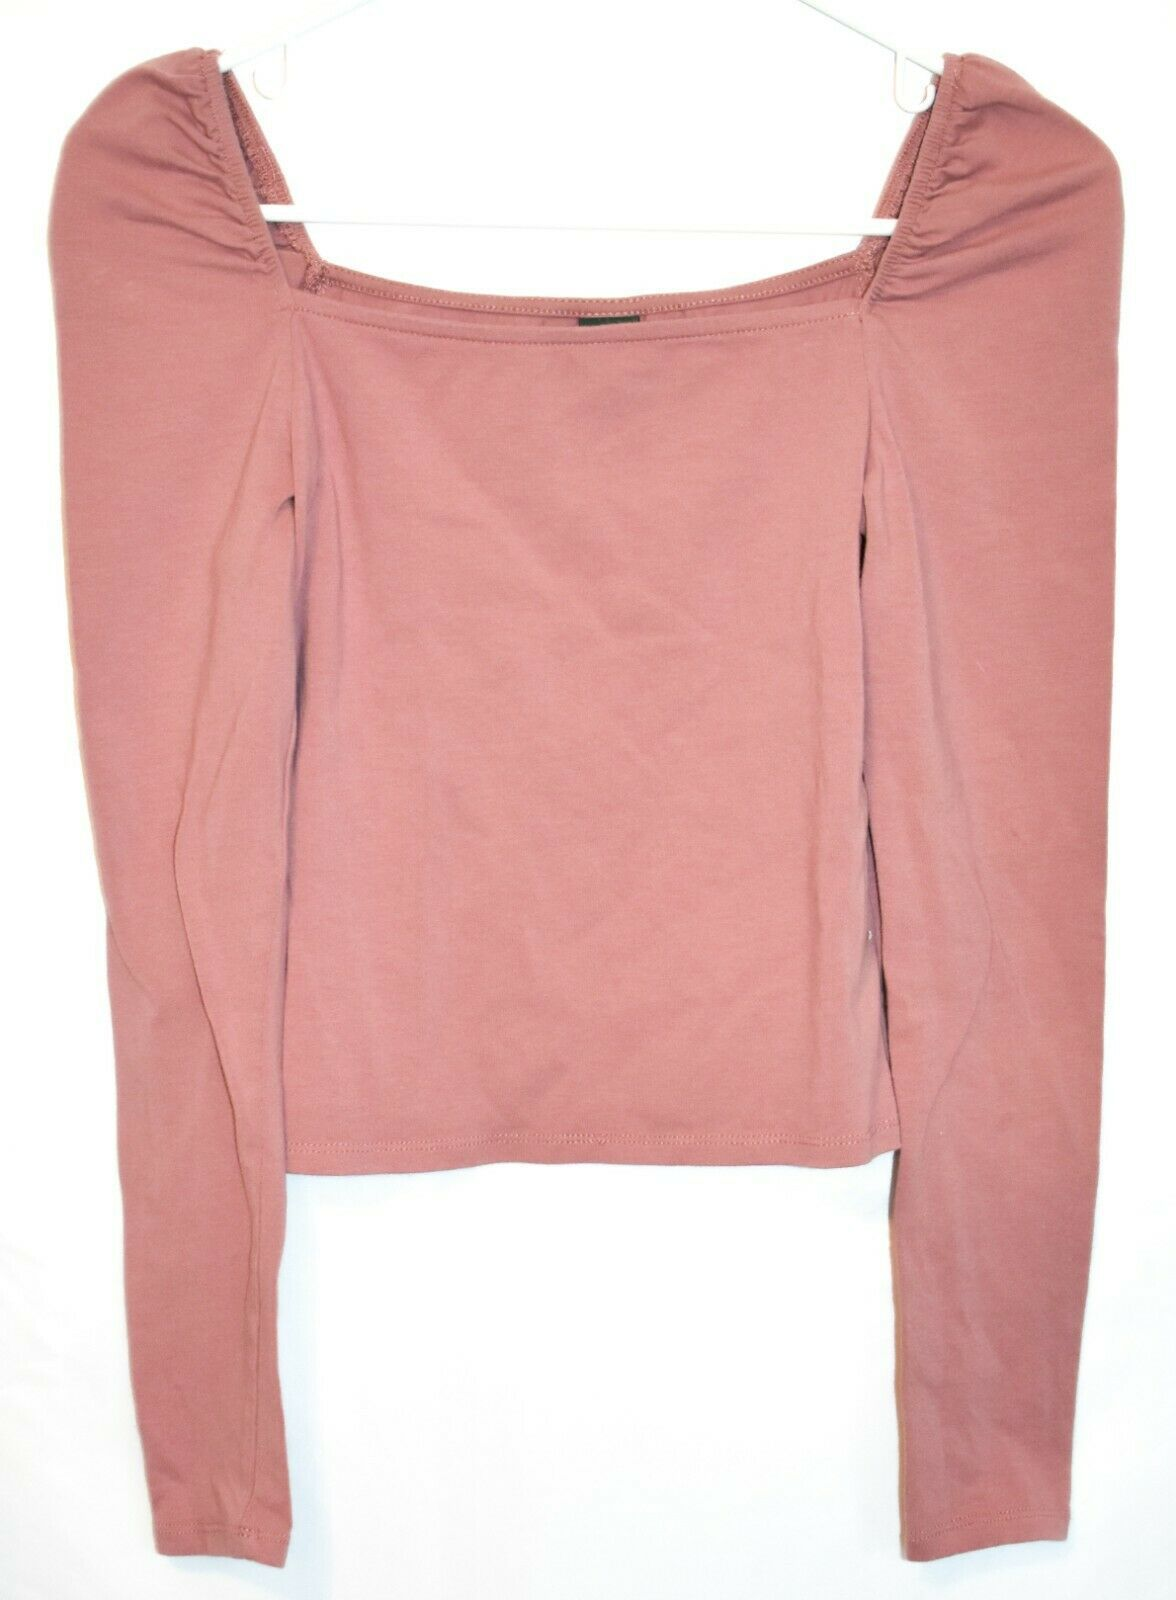 Wild Fable Women's Mauve Pink Square Neck Crop Long Sleeve Shirt Size S